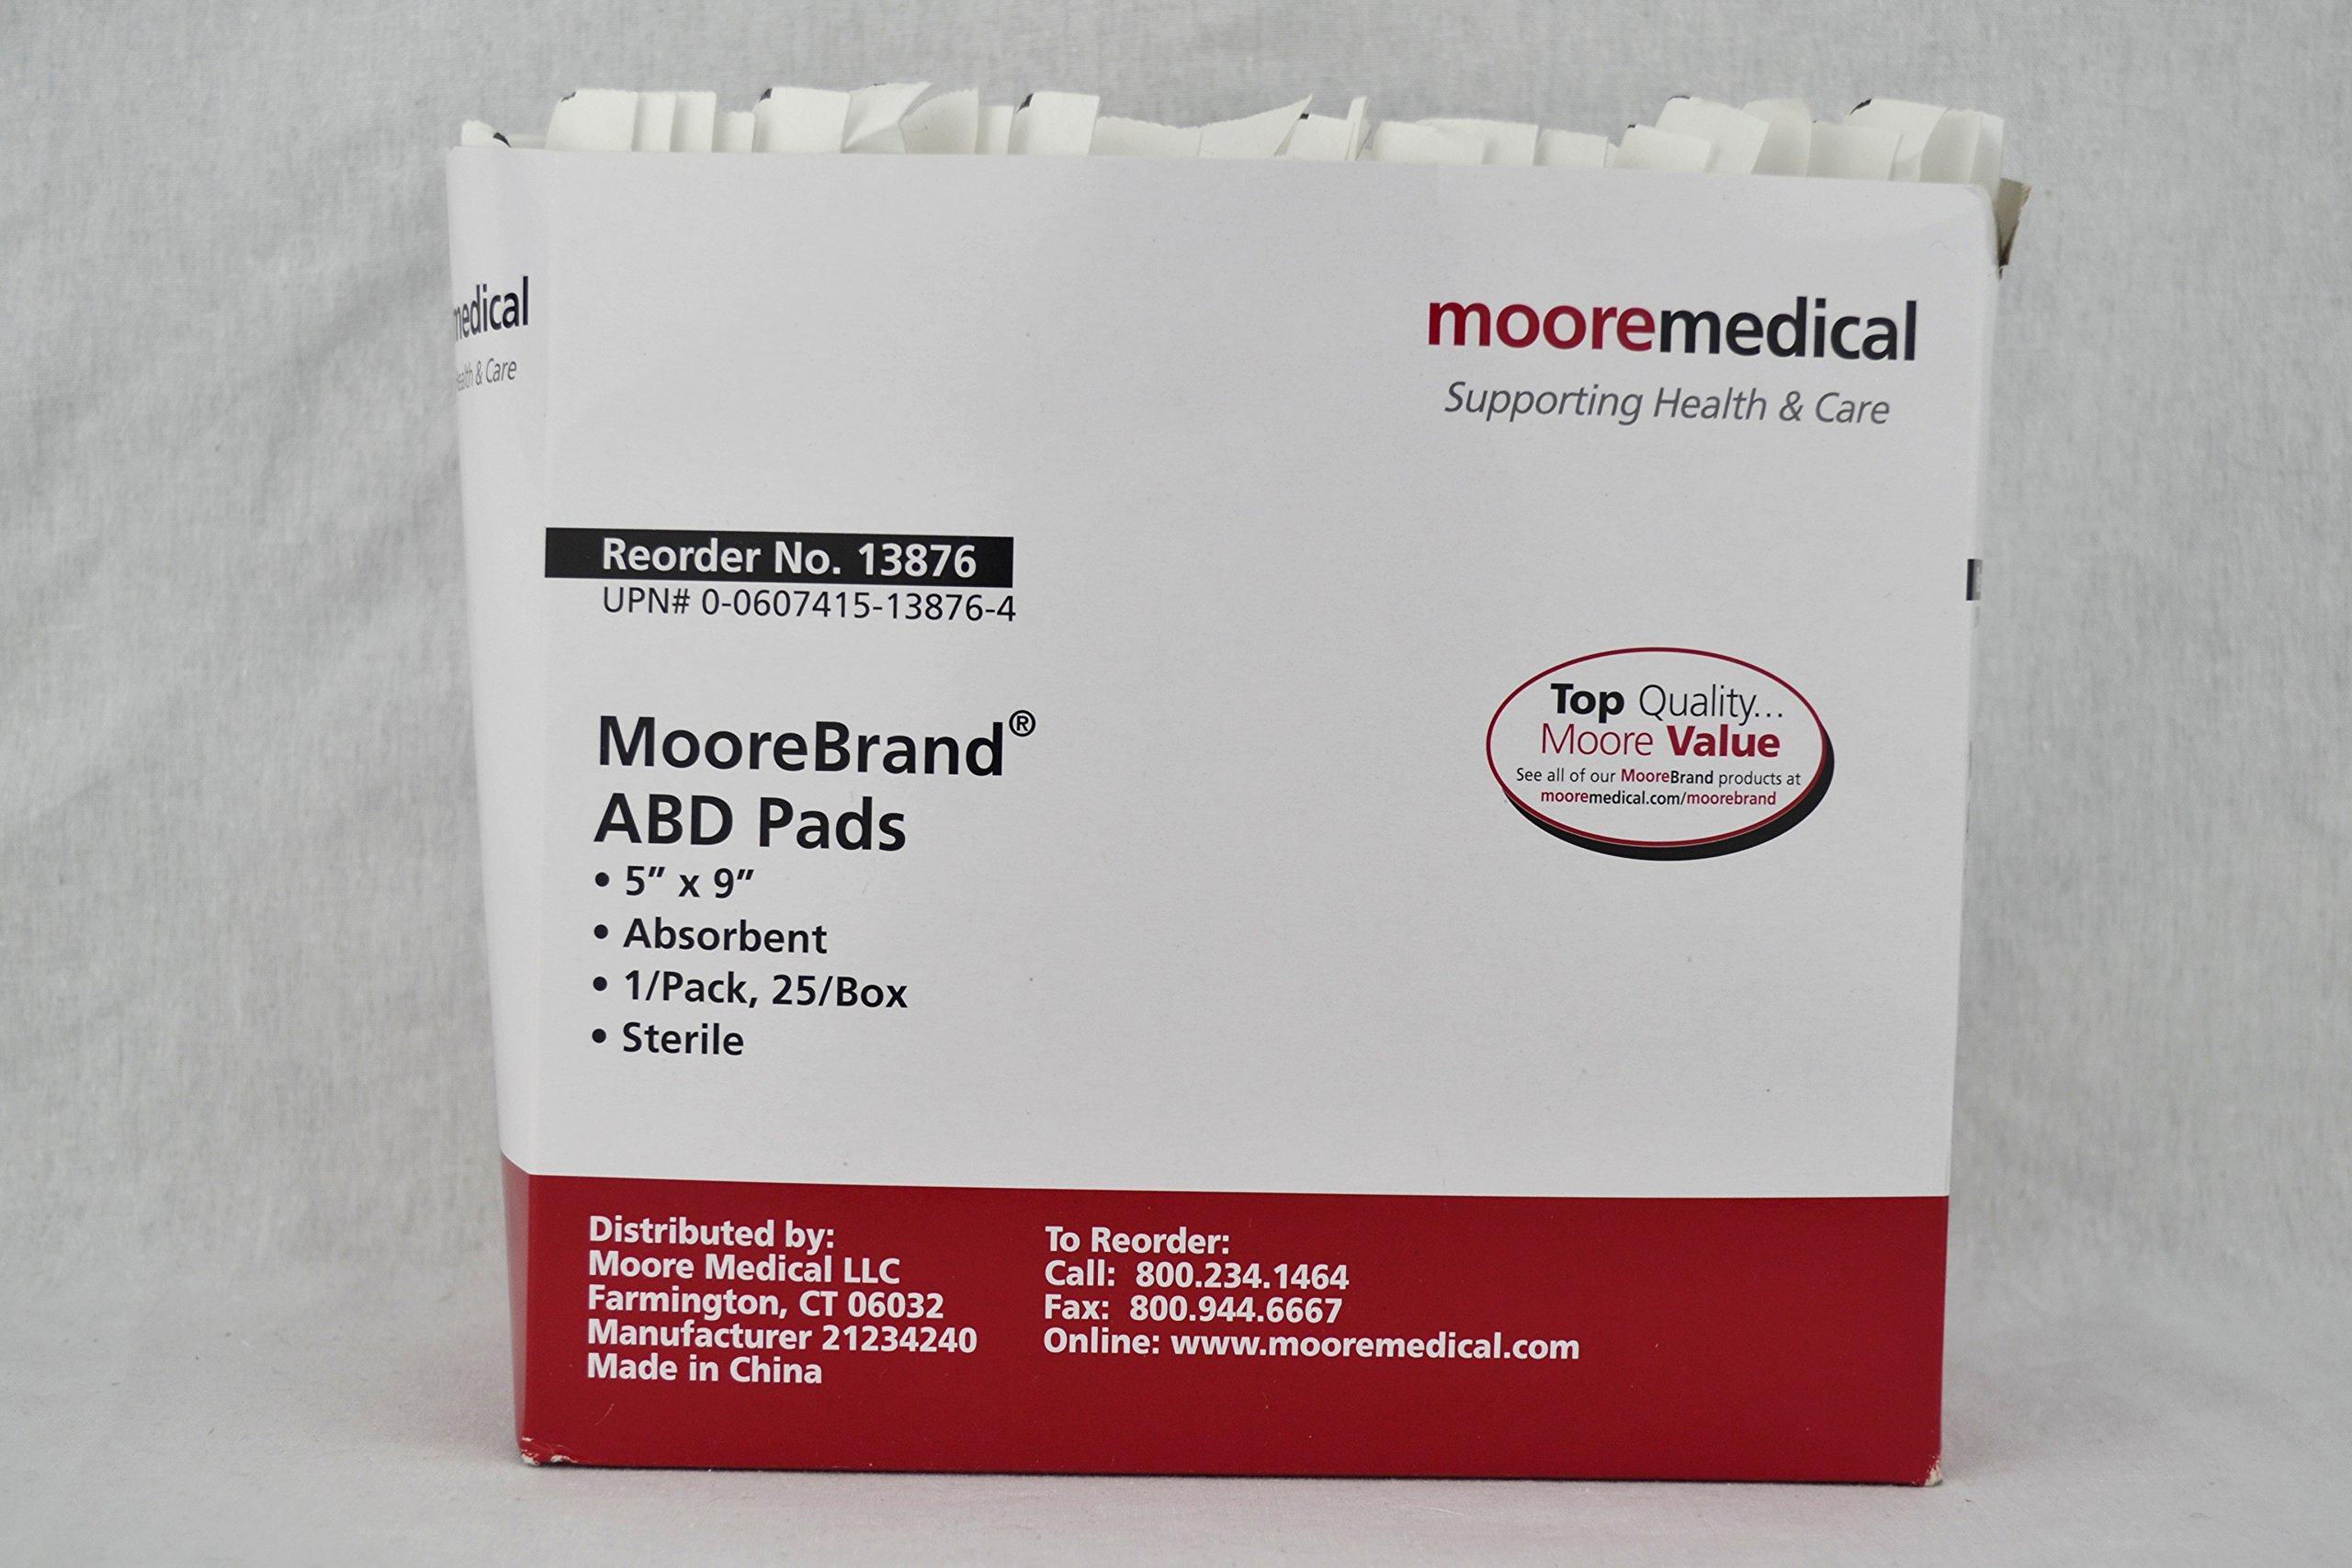 MooreBrand ABD Pads 5 x 9